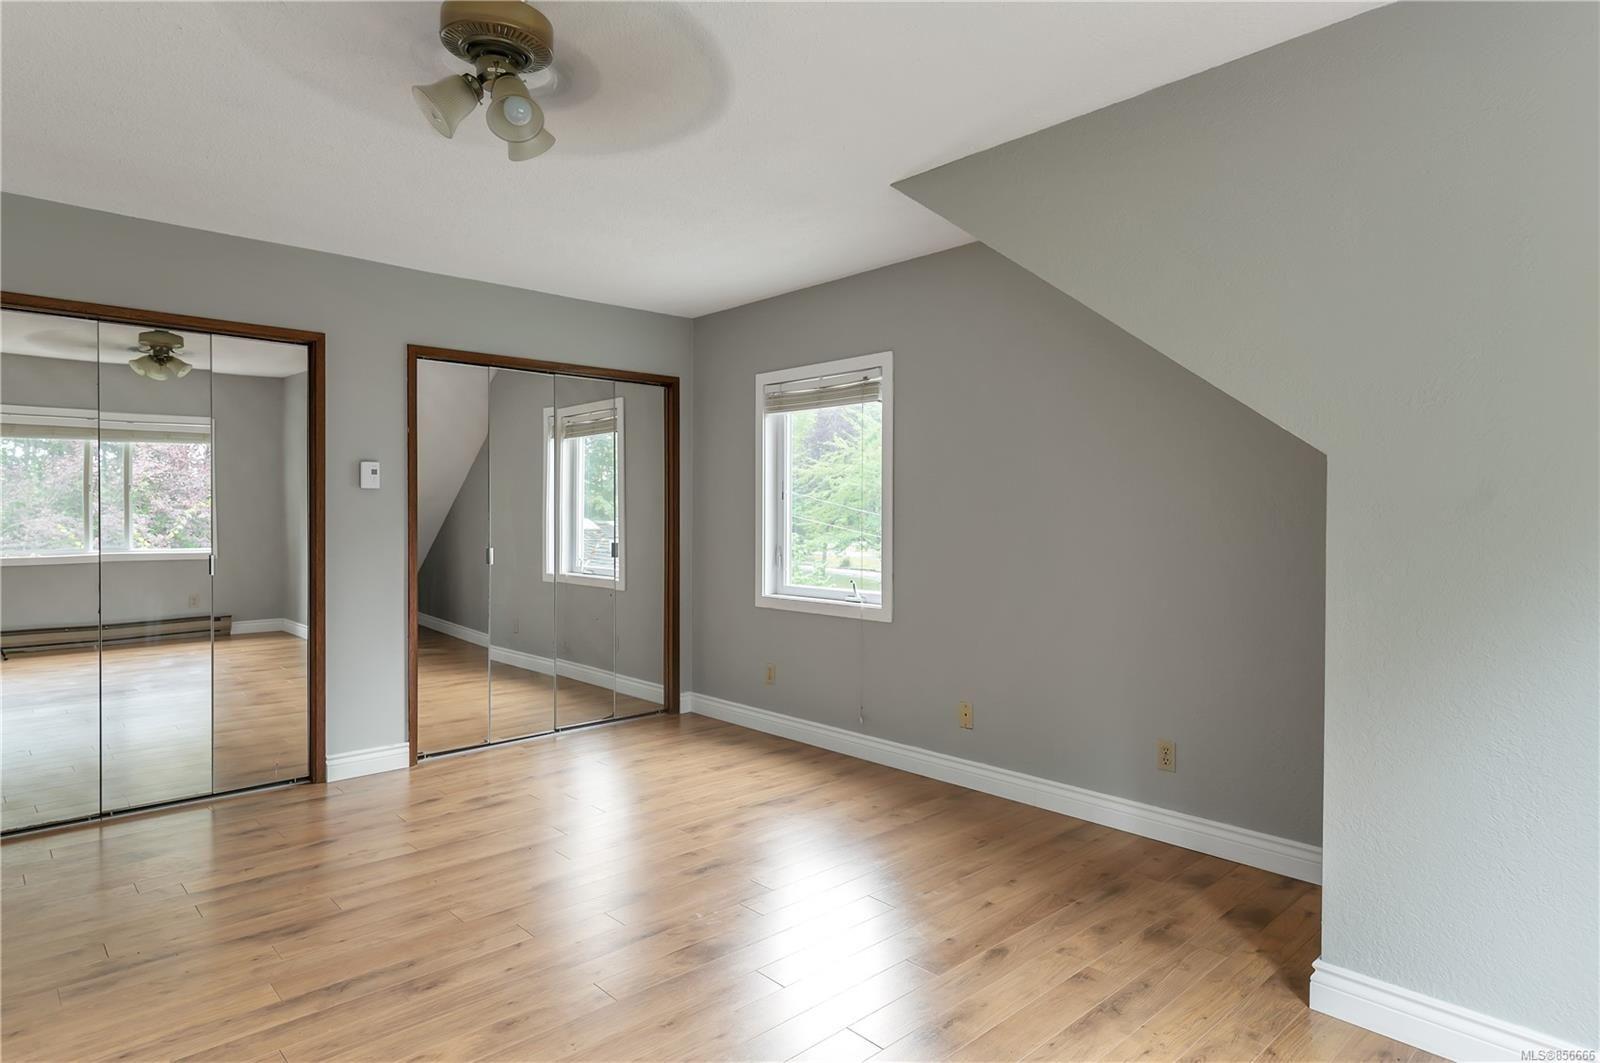 Photo 29: Photos: 2468 Oakes Rd in : CV Merville Black Creek House for sale (Comox Valley)  : MLS®# 856666